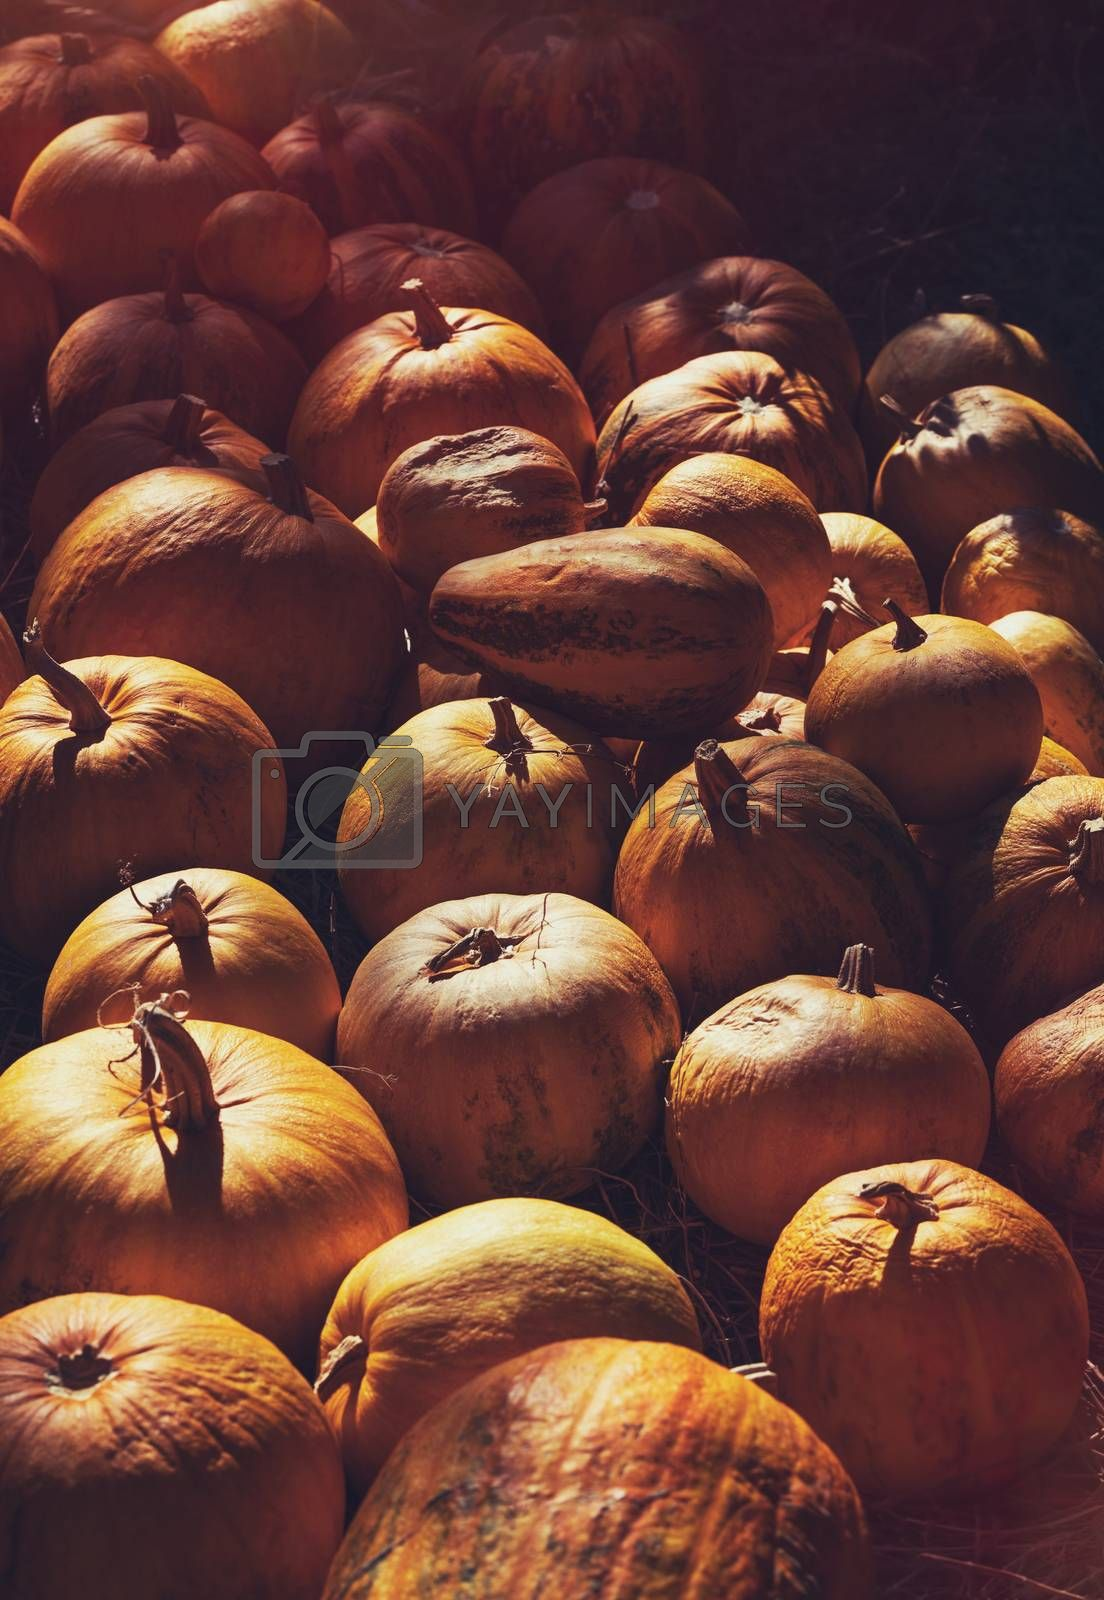 Ripe Orange Pumpkins in Mild Sunlight. Autumn Harvest Season. Traditional Thanksgiving Food and Halloween Decoration.